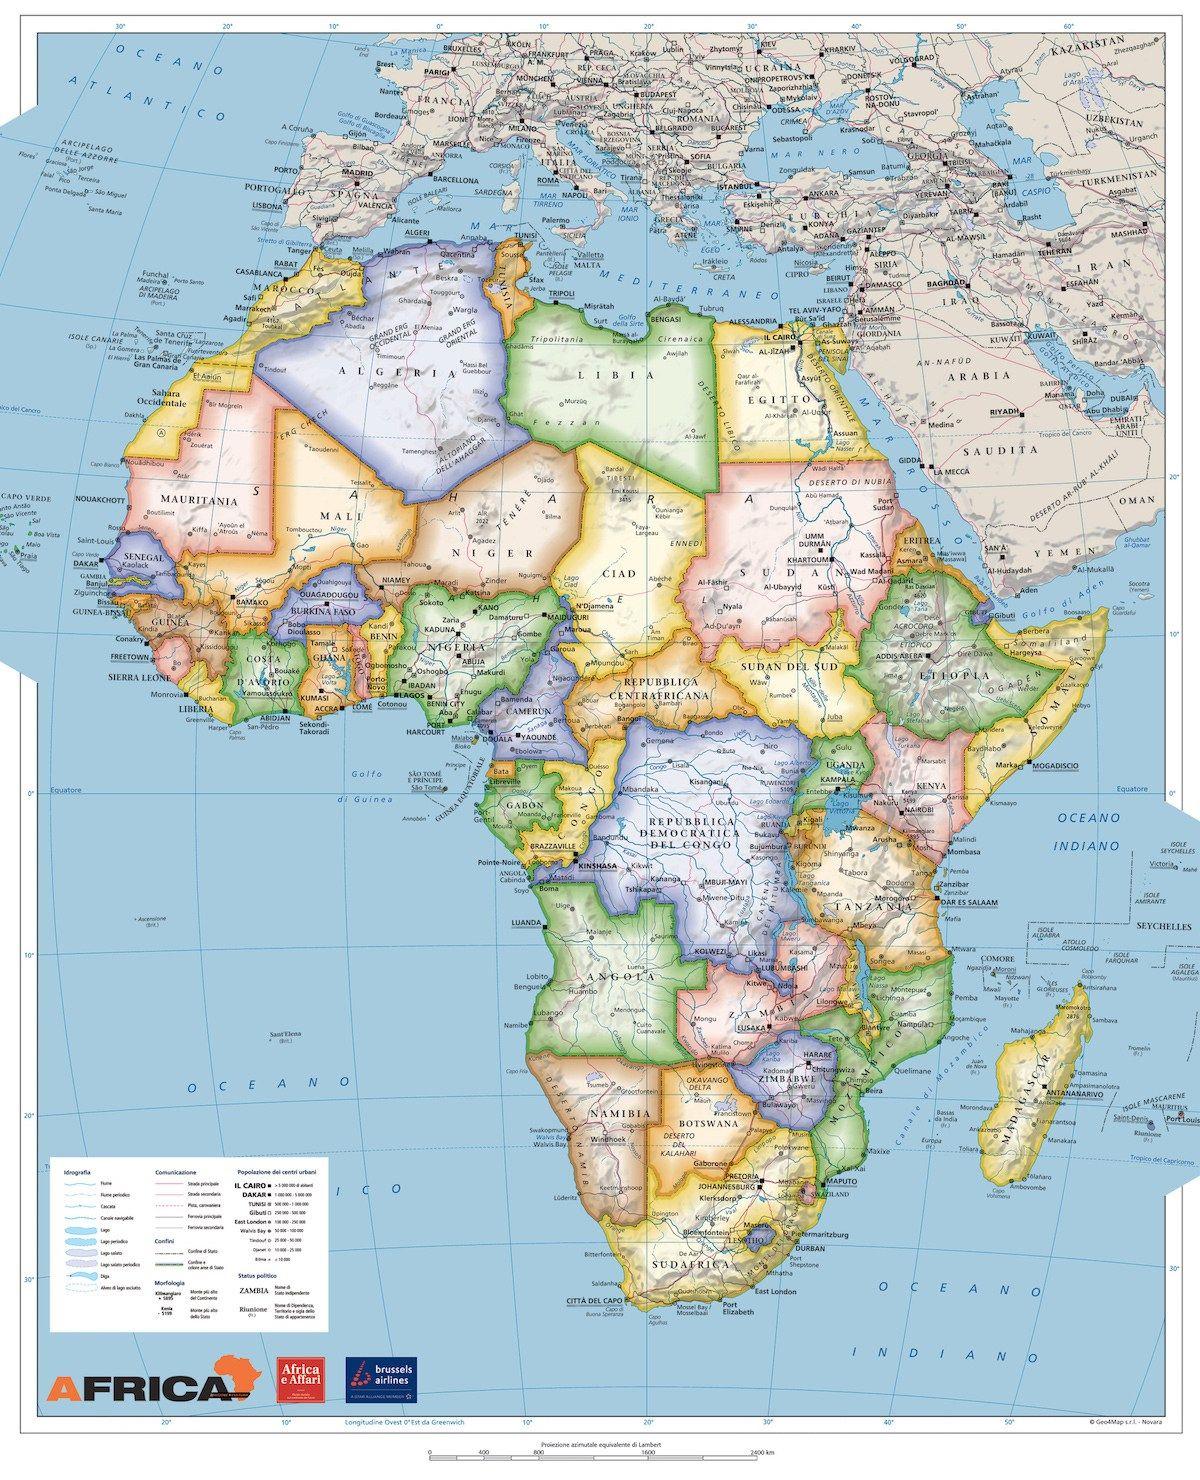 Cartina Europa E Africa.Cartina Europa Africa Risultati Yahoo Yahoo Italia Della Ricerca Di Immagini Africa Immagini Europa